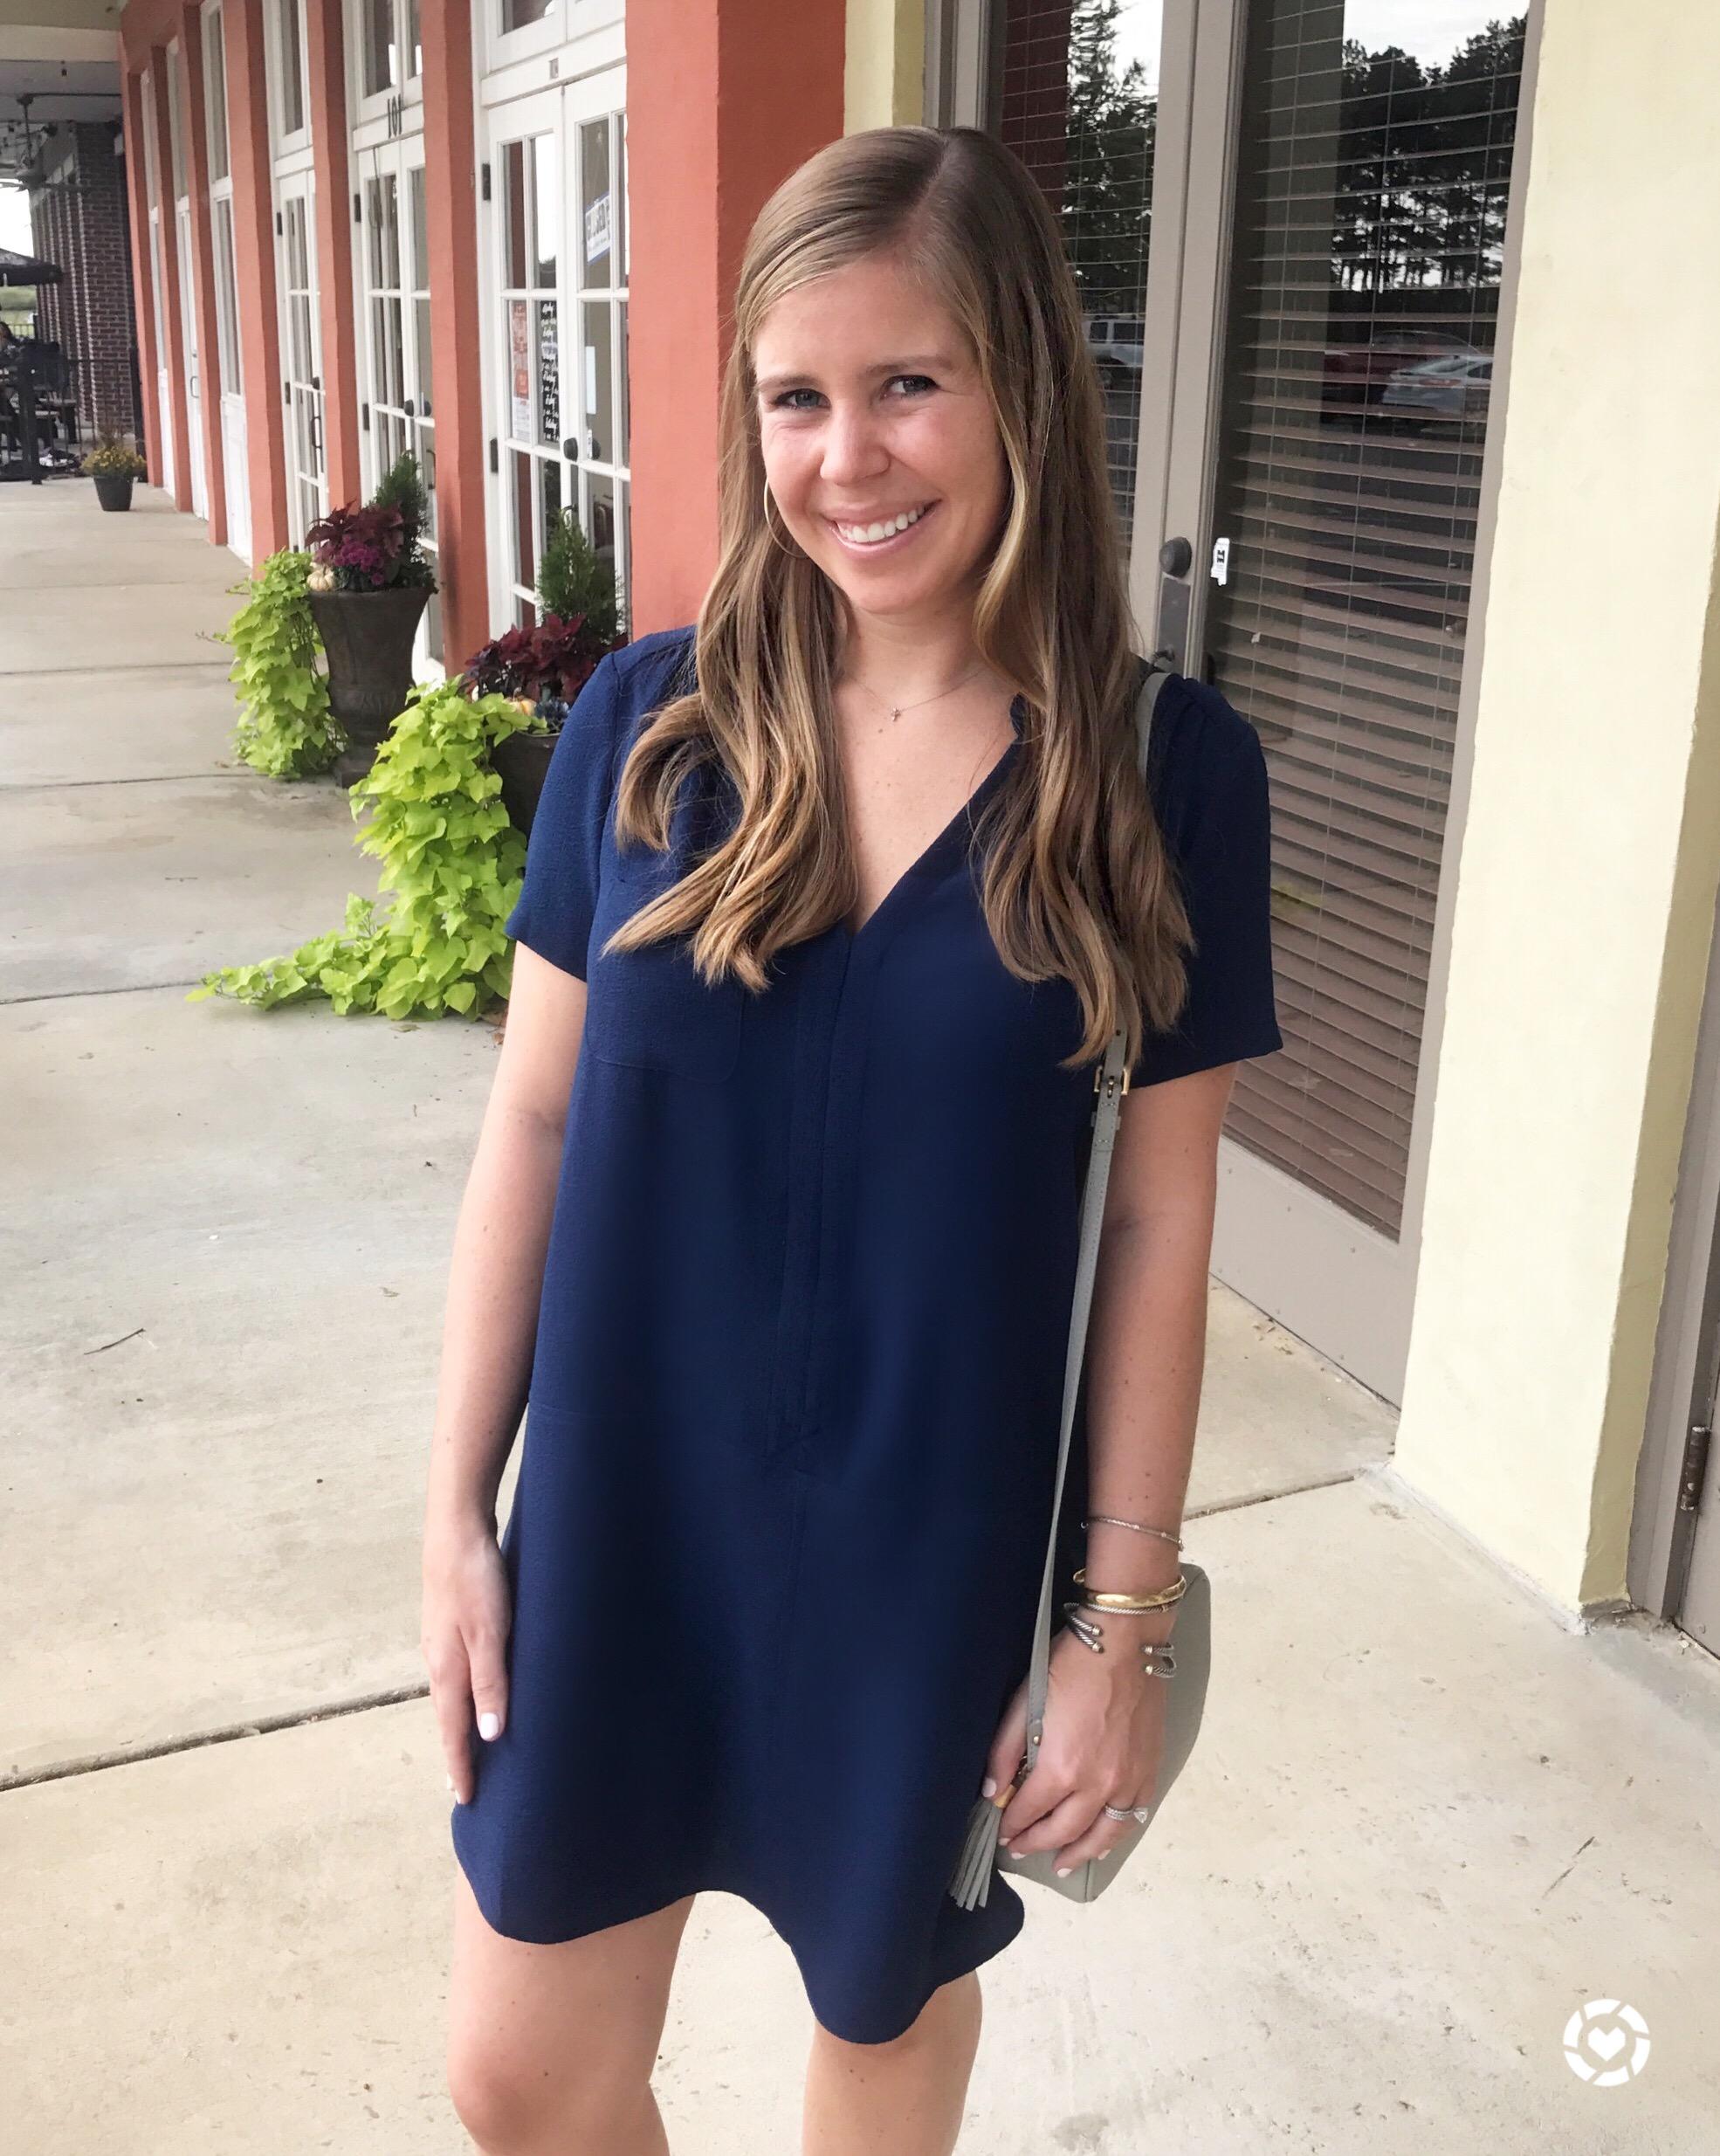 Hailey Crepe Dress //  Crossbody Bag